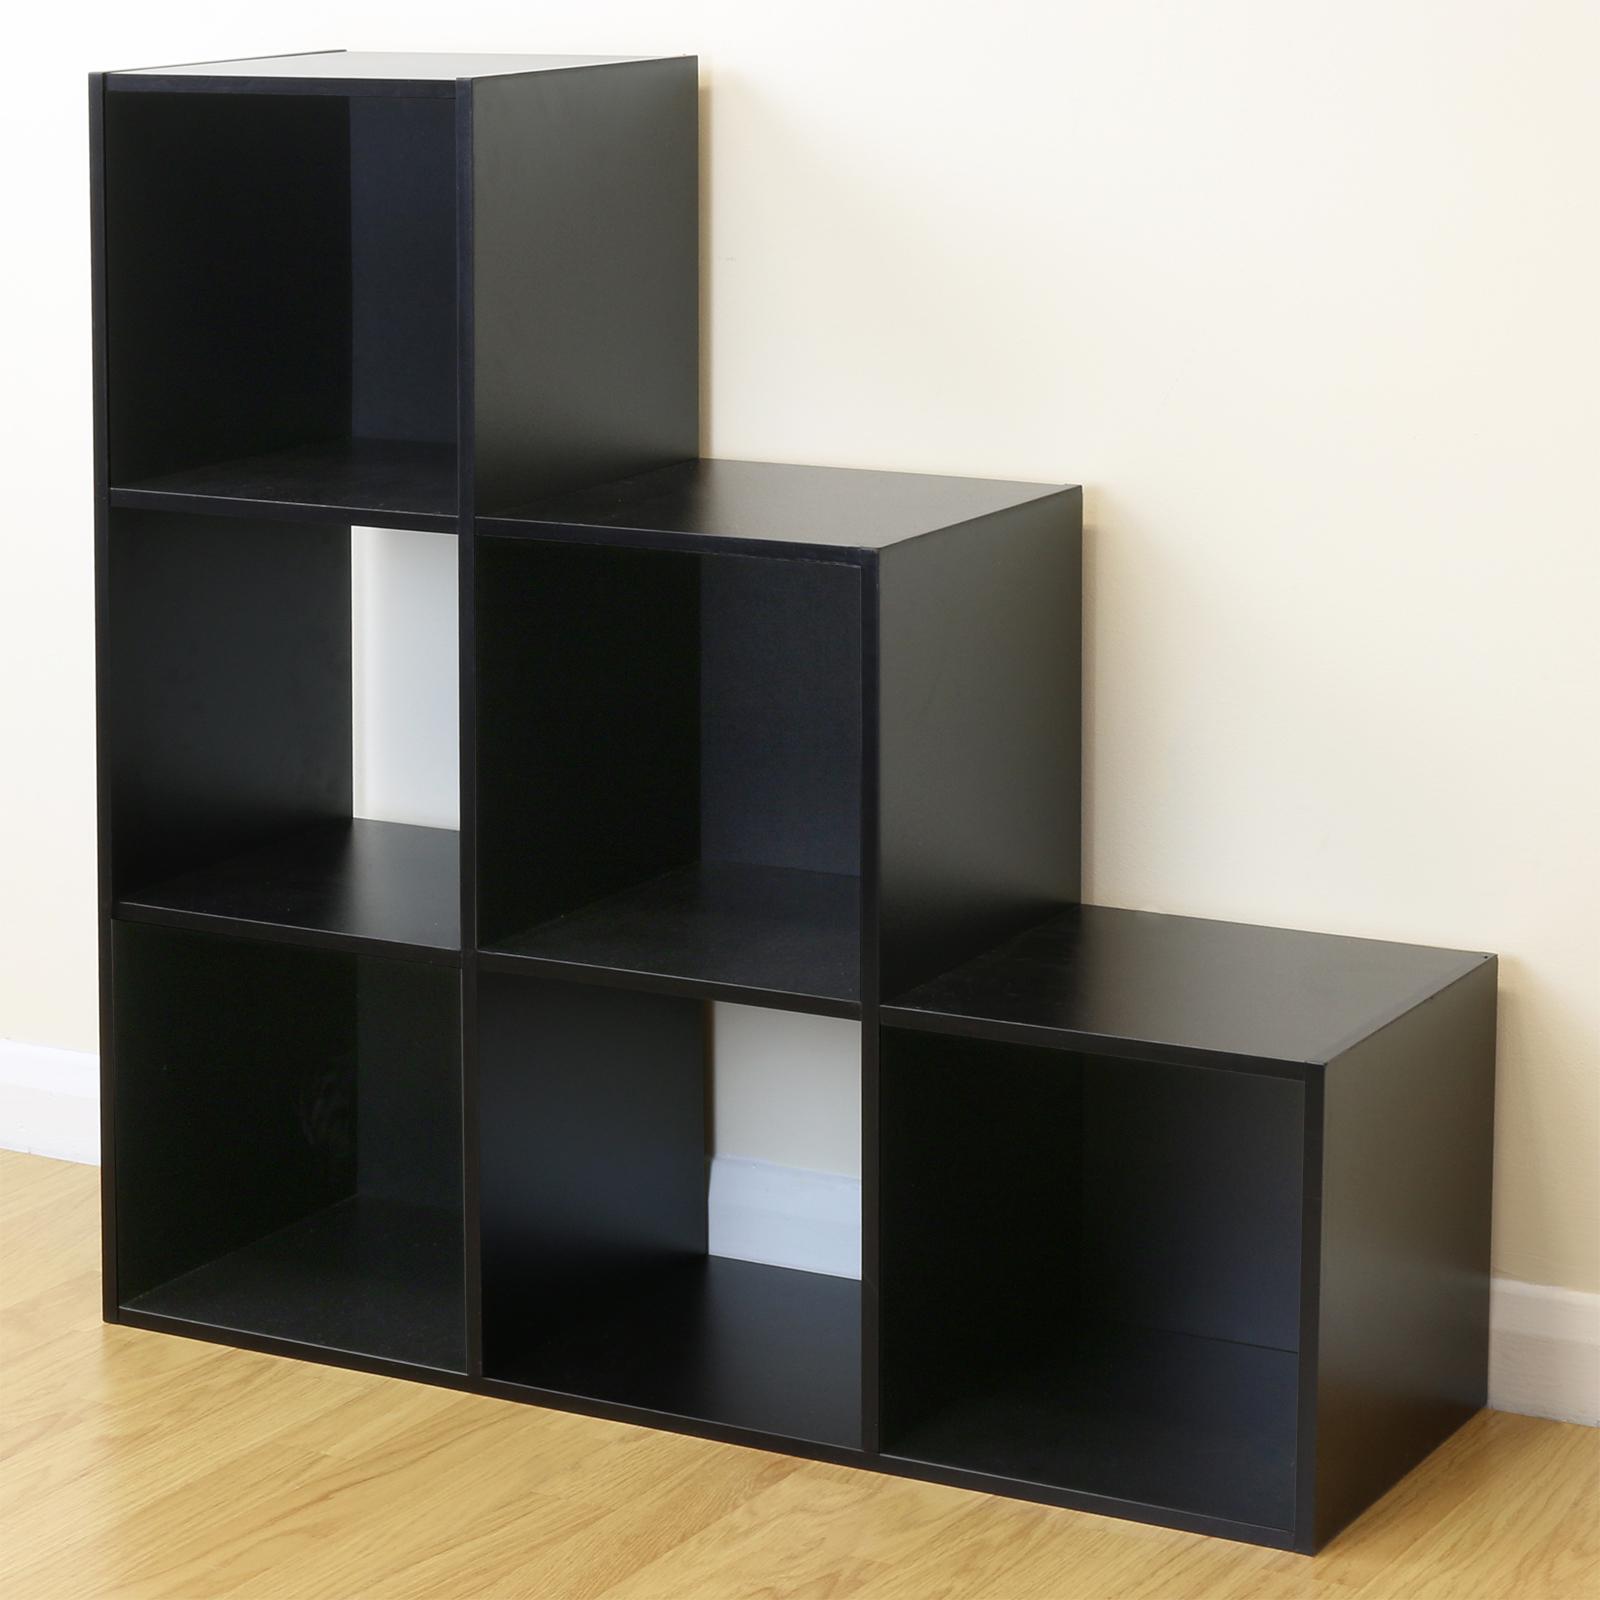 Childrens Animals Storage Box Chest 3 Kids Drawer Bedroom: Black 6 Cube Kids Toy/Games Storage Unit Girls/Boys